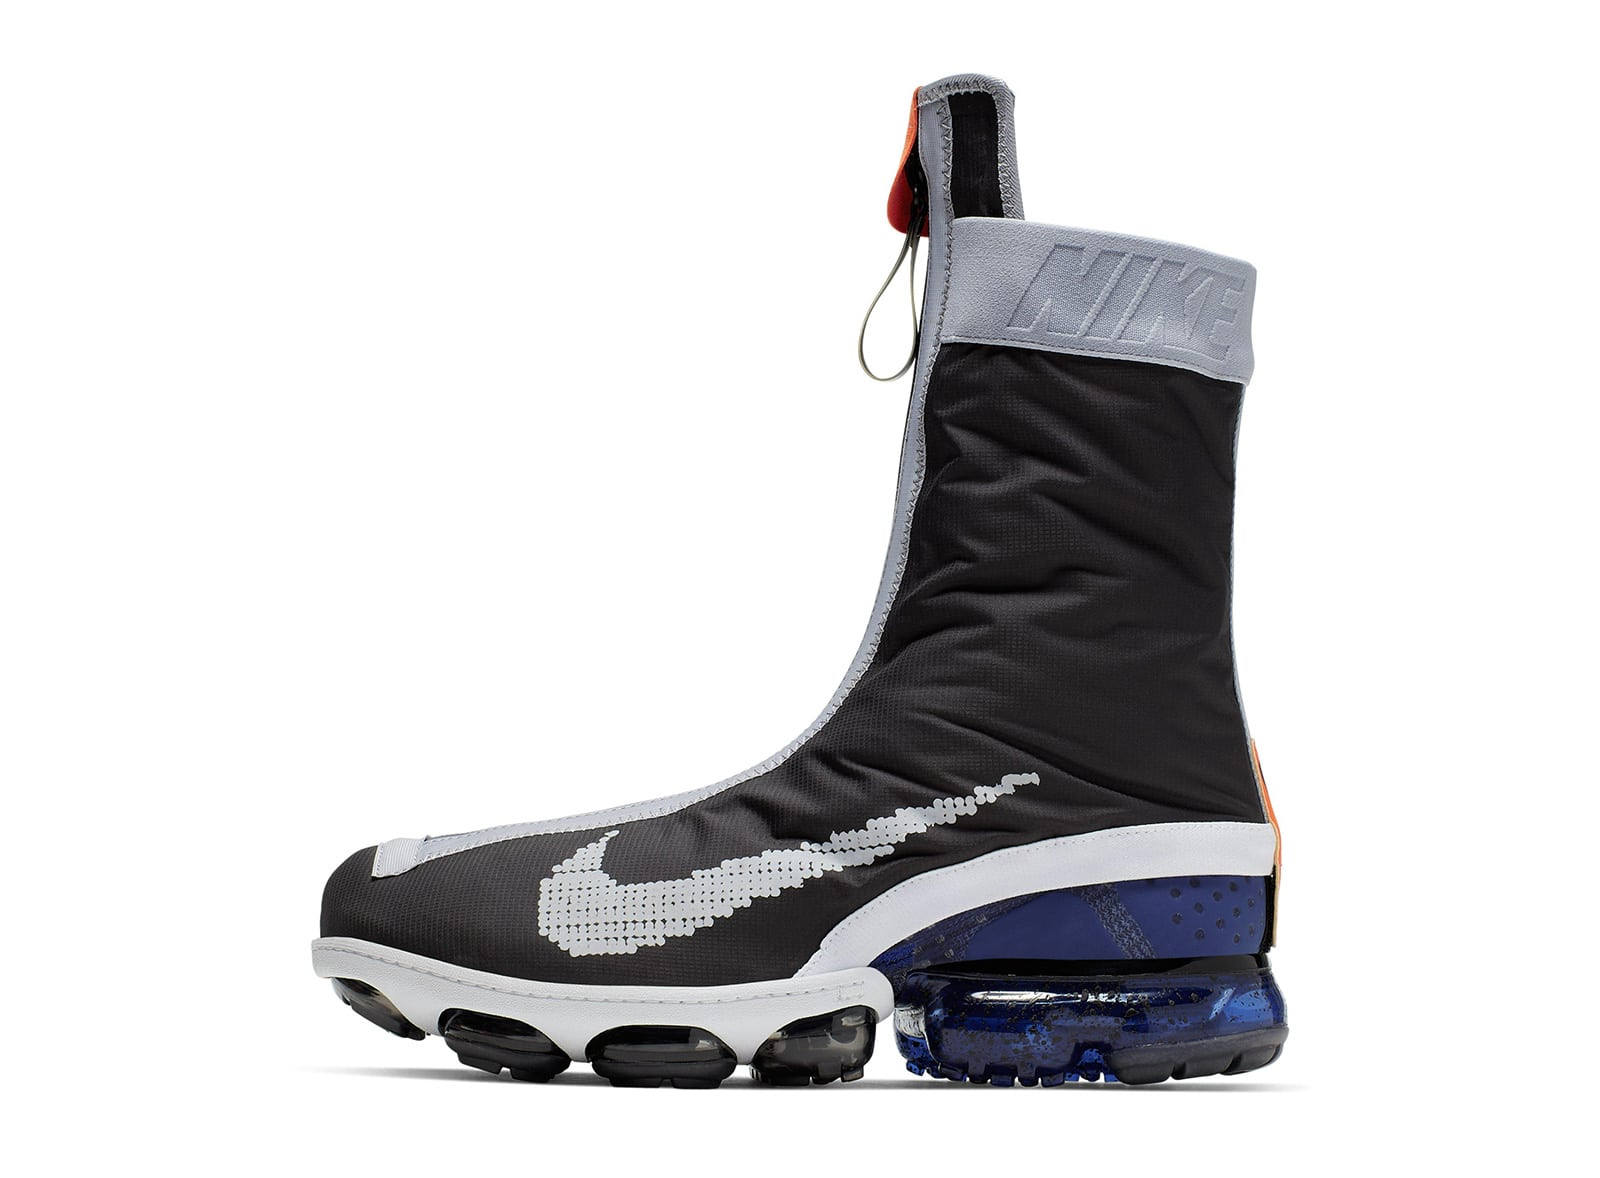 Nike ISPA Air VaporMax Flyknit Gator